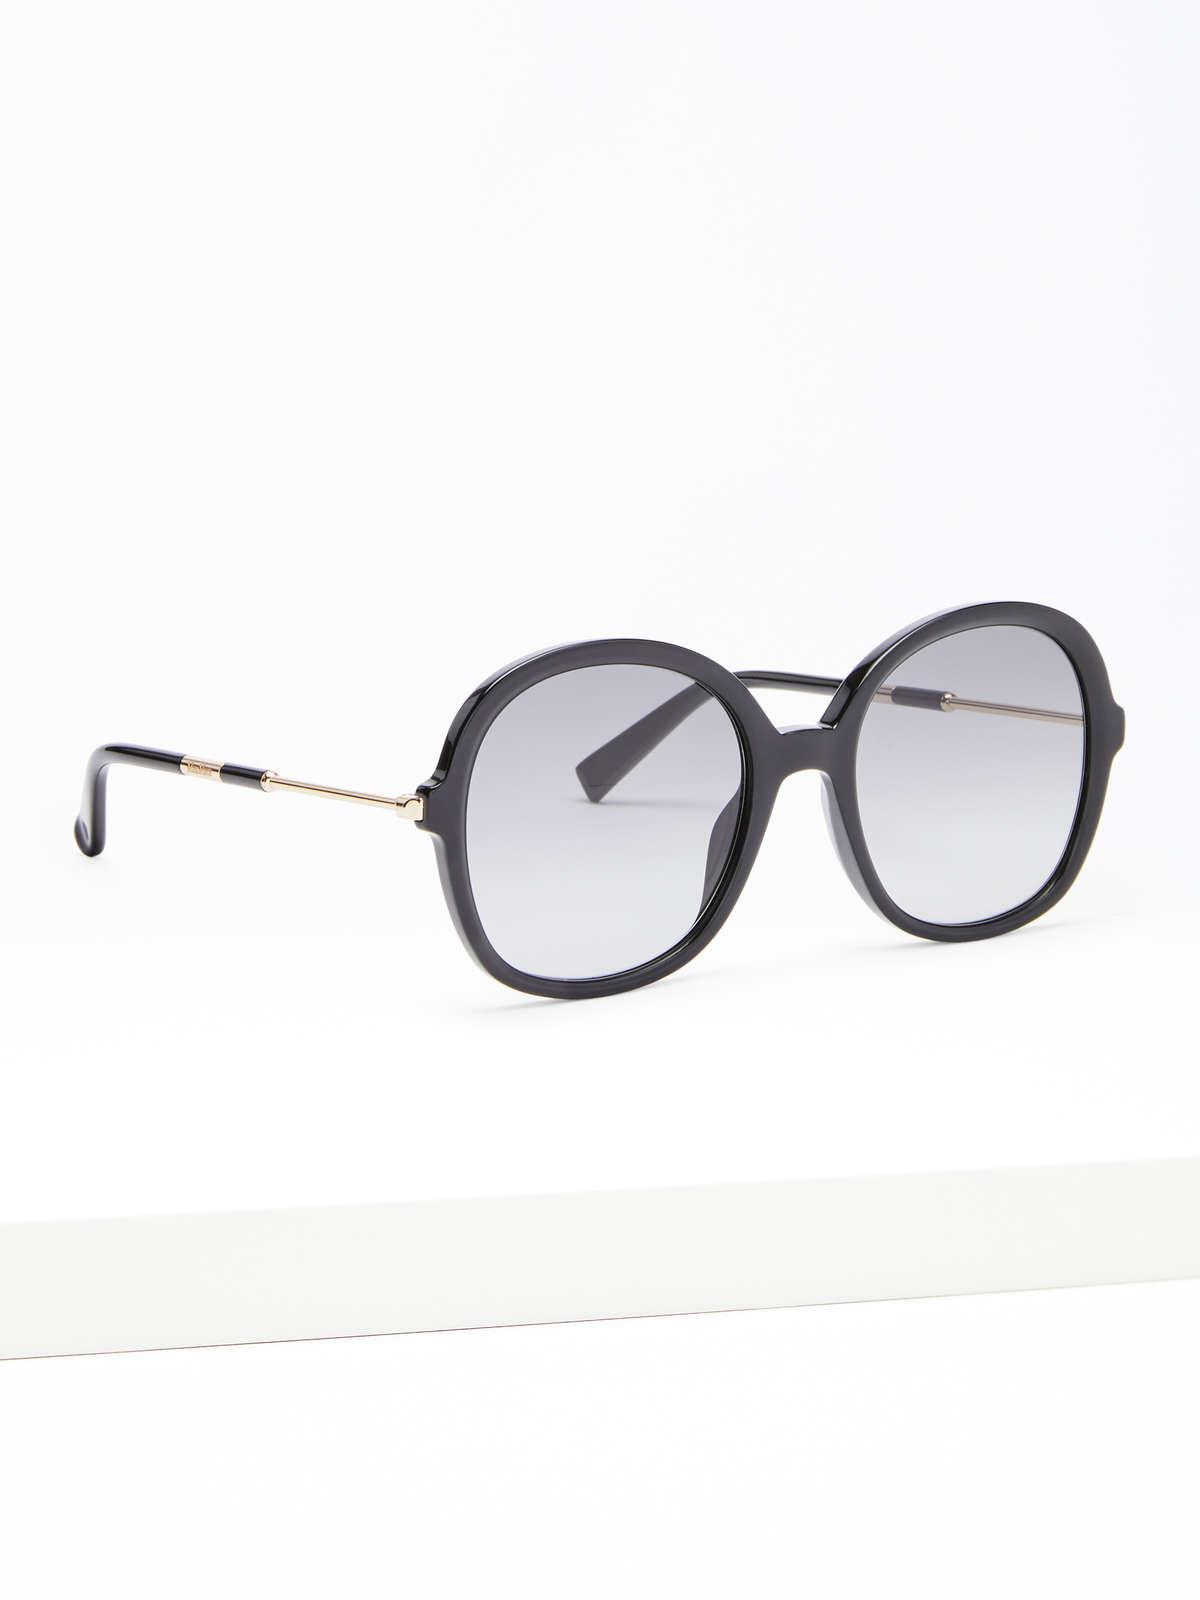 Max Mara - Oversize-Sonnenbrille - 2